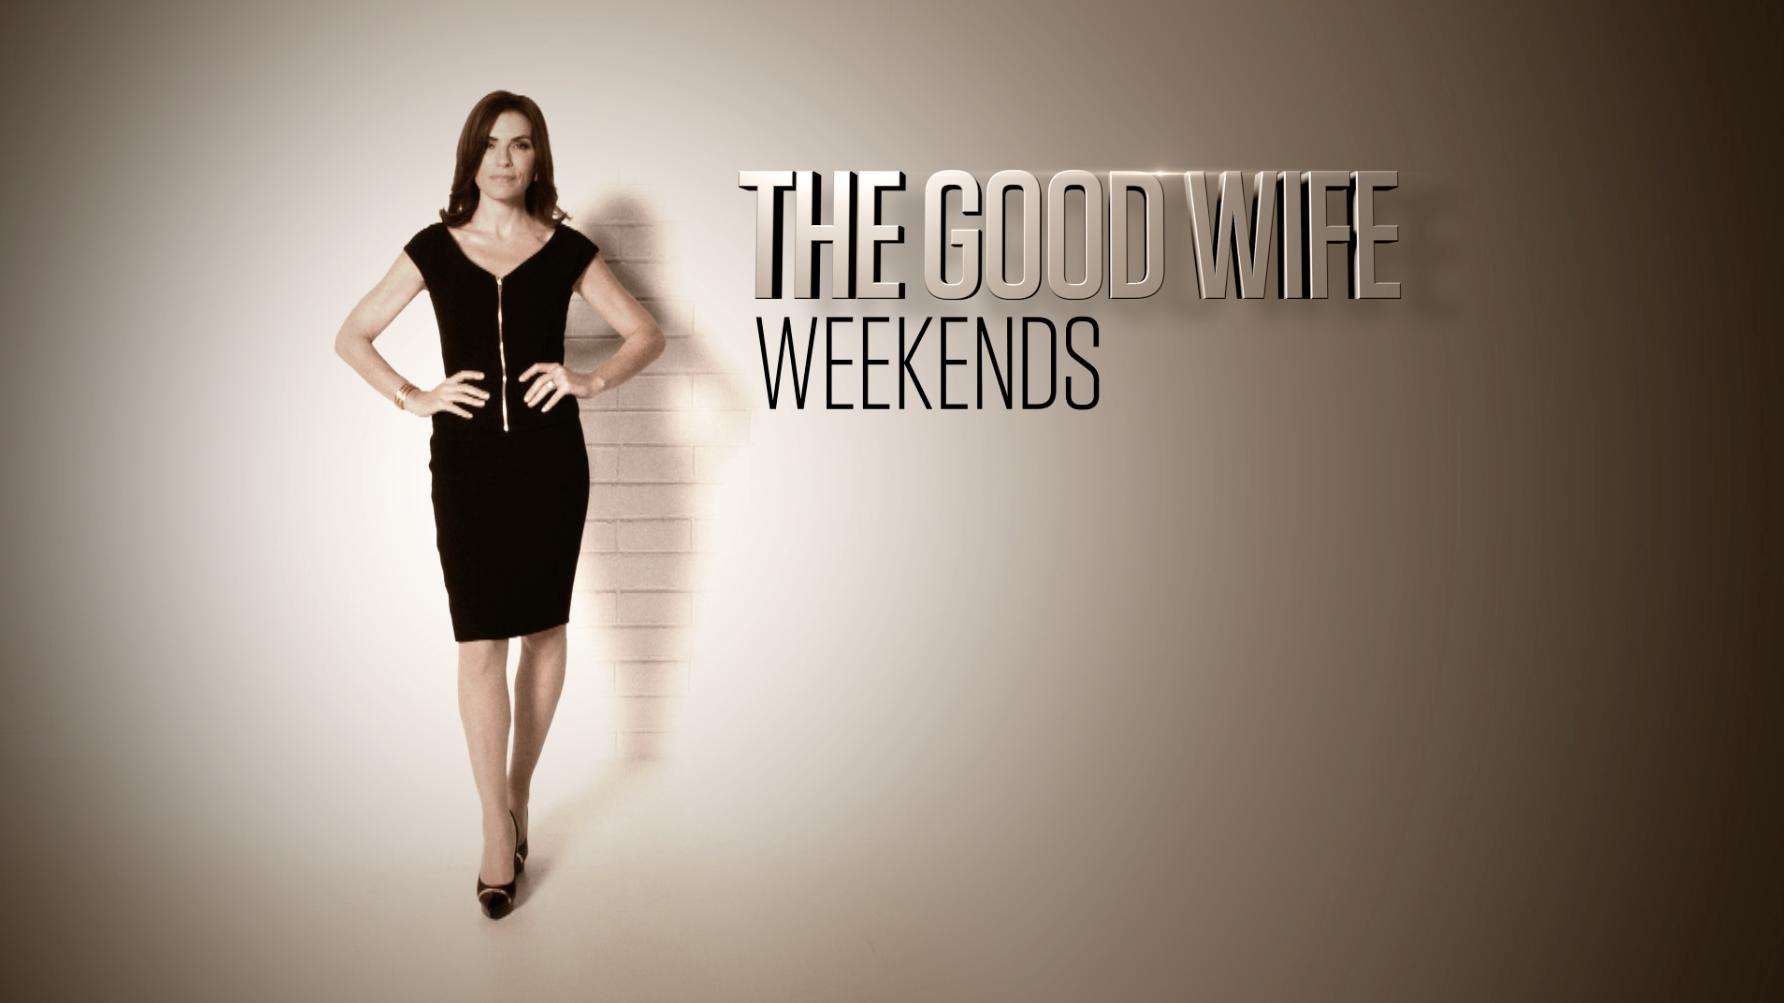 THE GOOD WIFE - CRITICS QUOTES #1 (TV30)